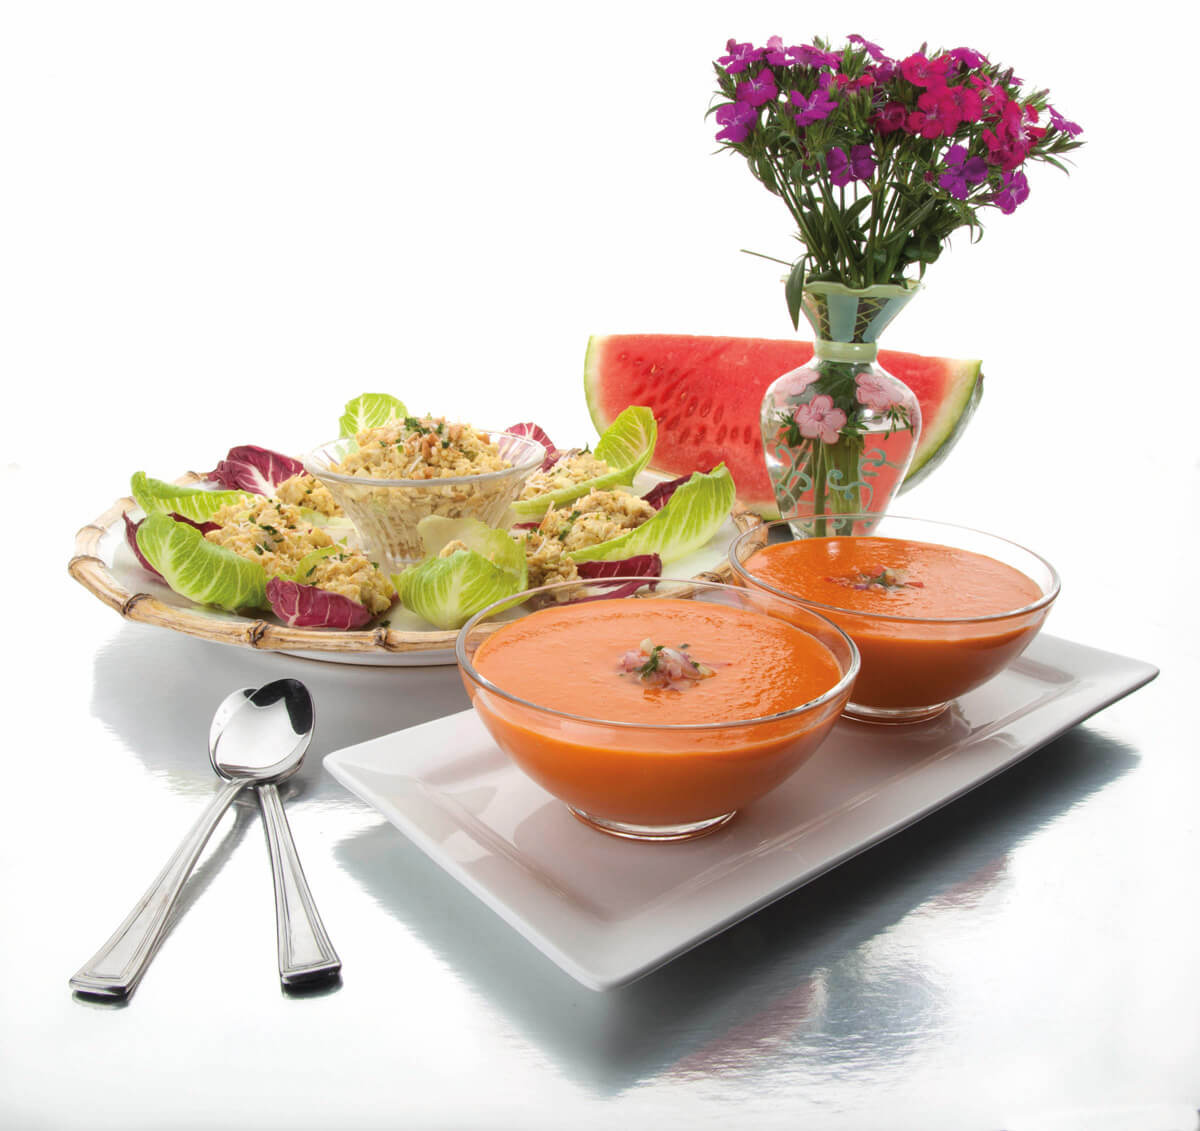 Watermelon Gazpacho and Curried Coconut Chicken Salad